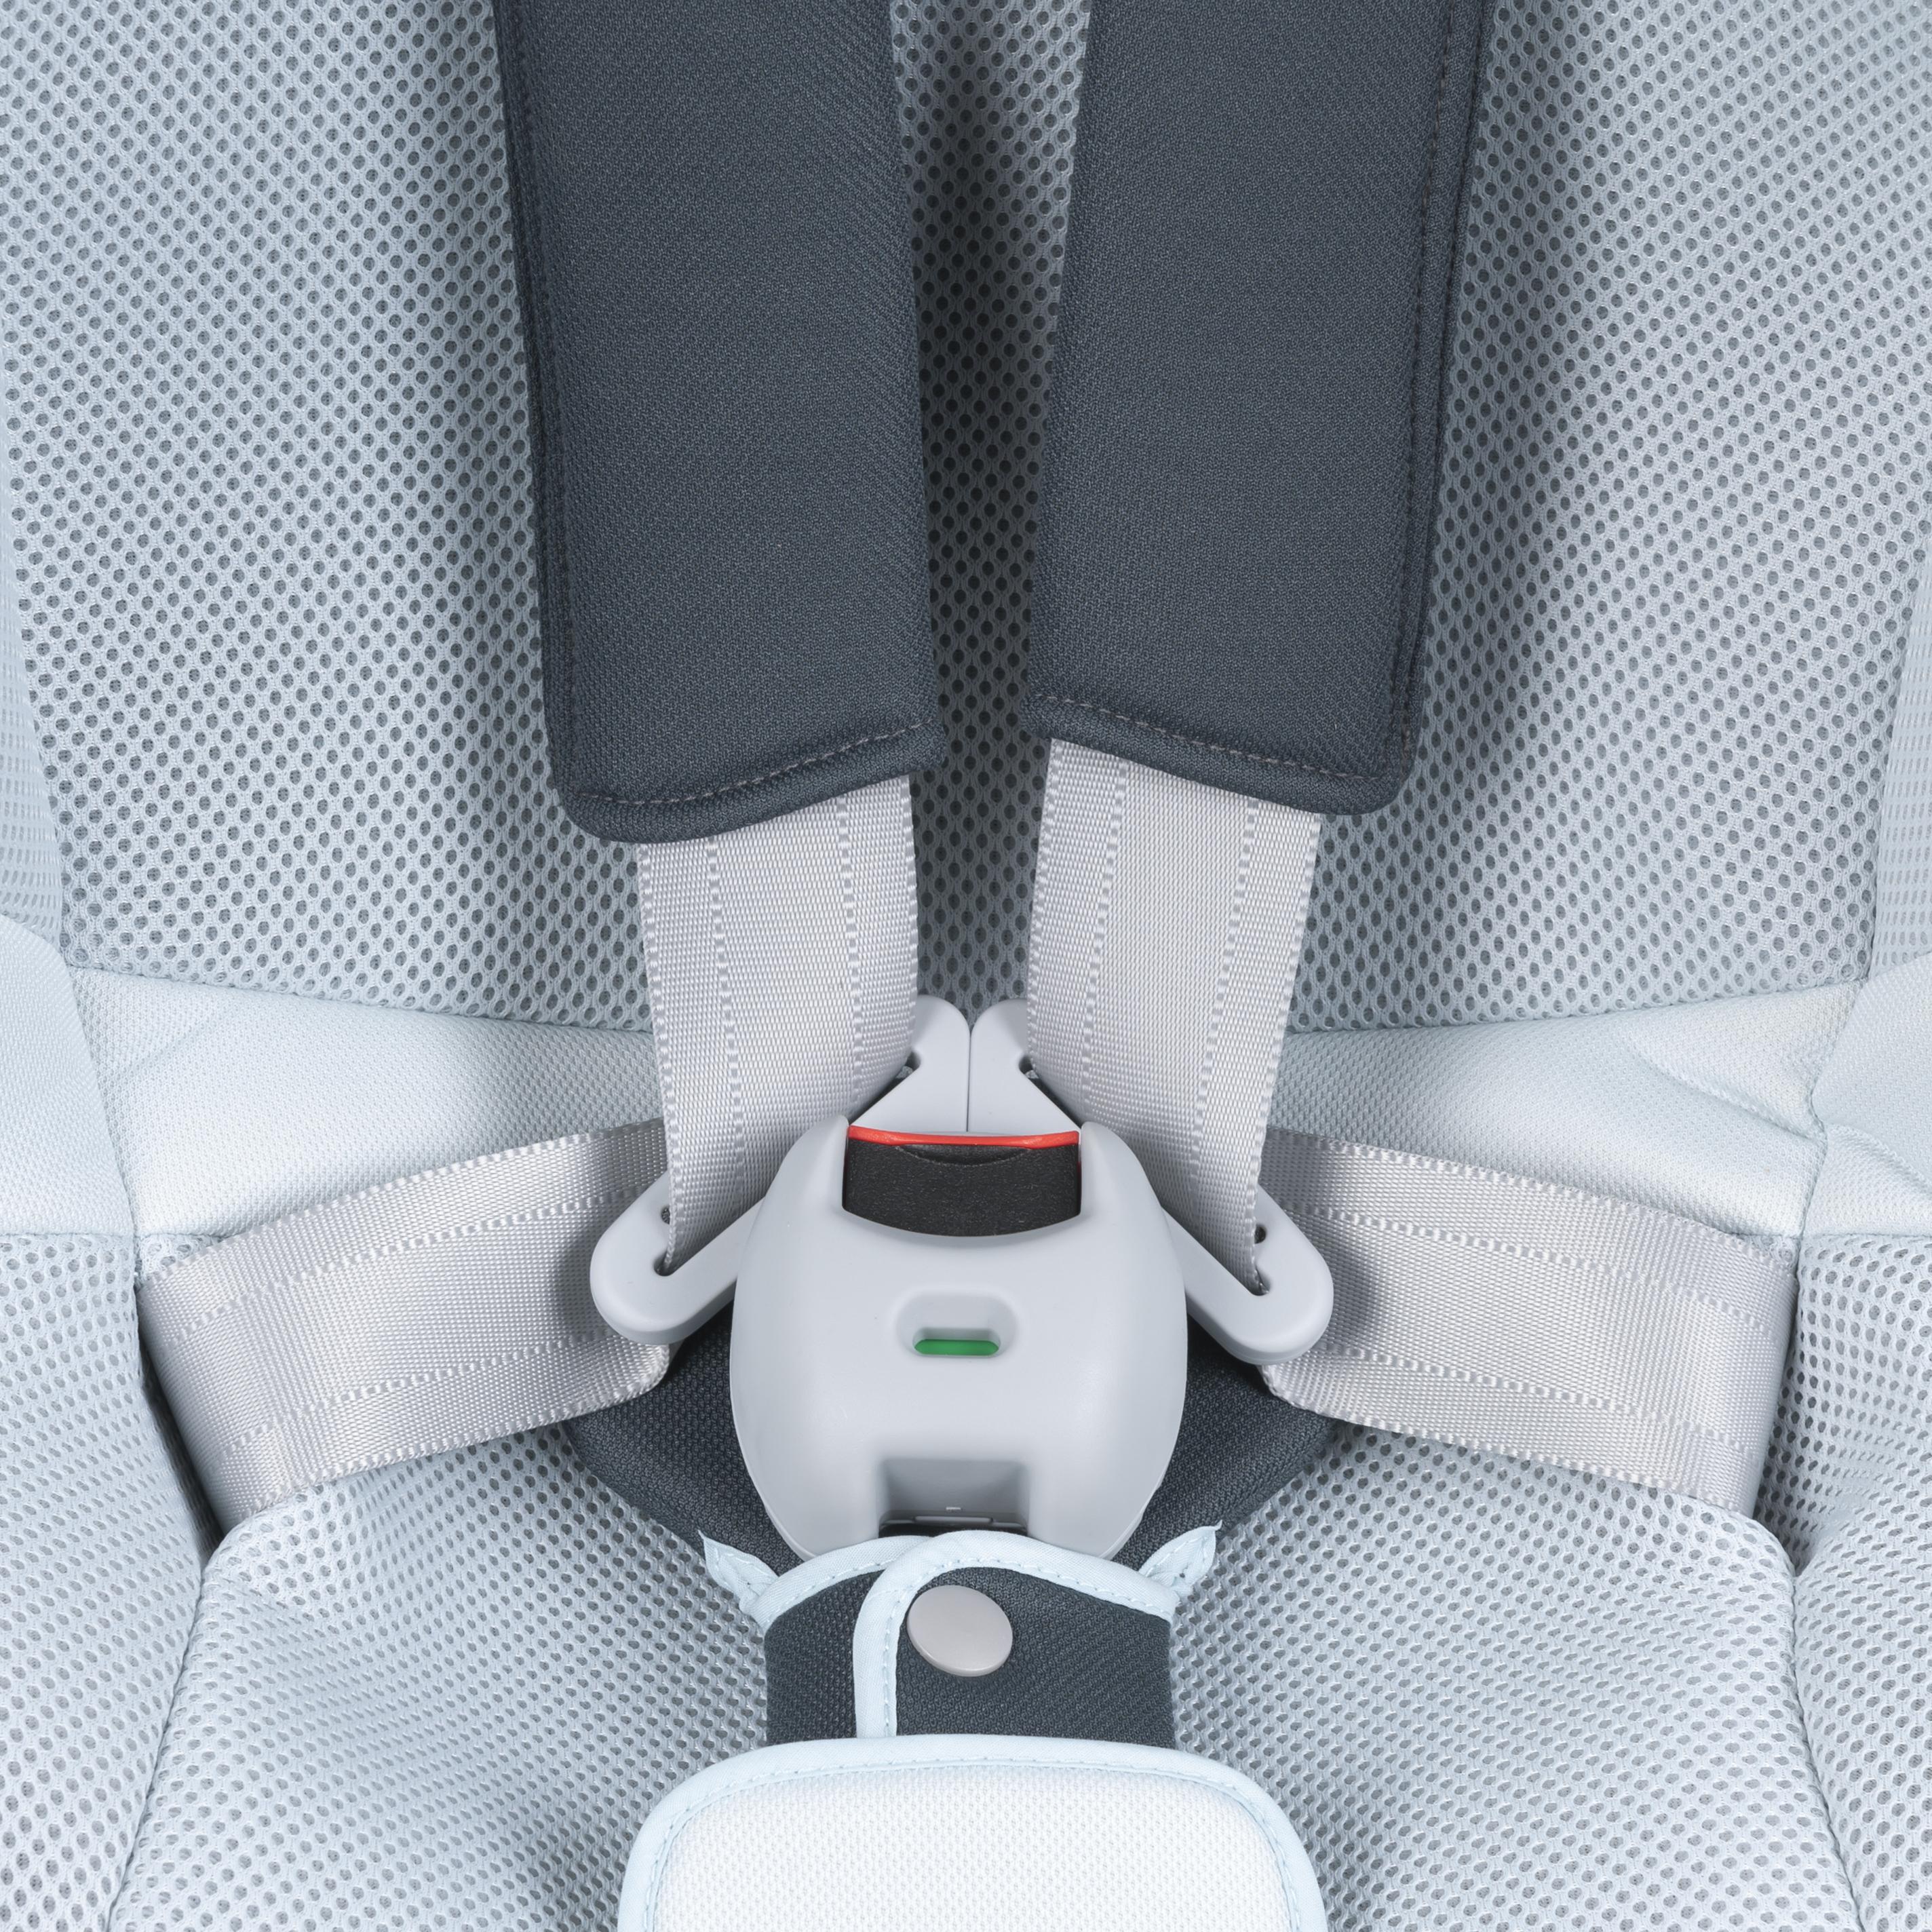 Carmate «Swing Moon» Ice Grey - Детское автокресло от 9 до 25 кг. (ALC450E)(205319)